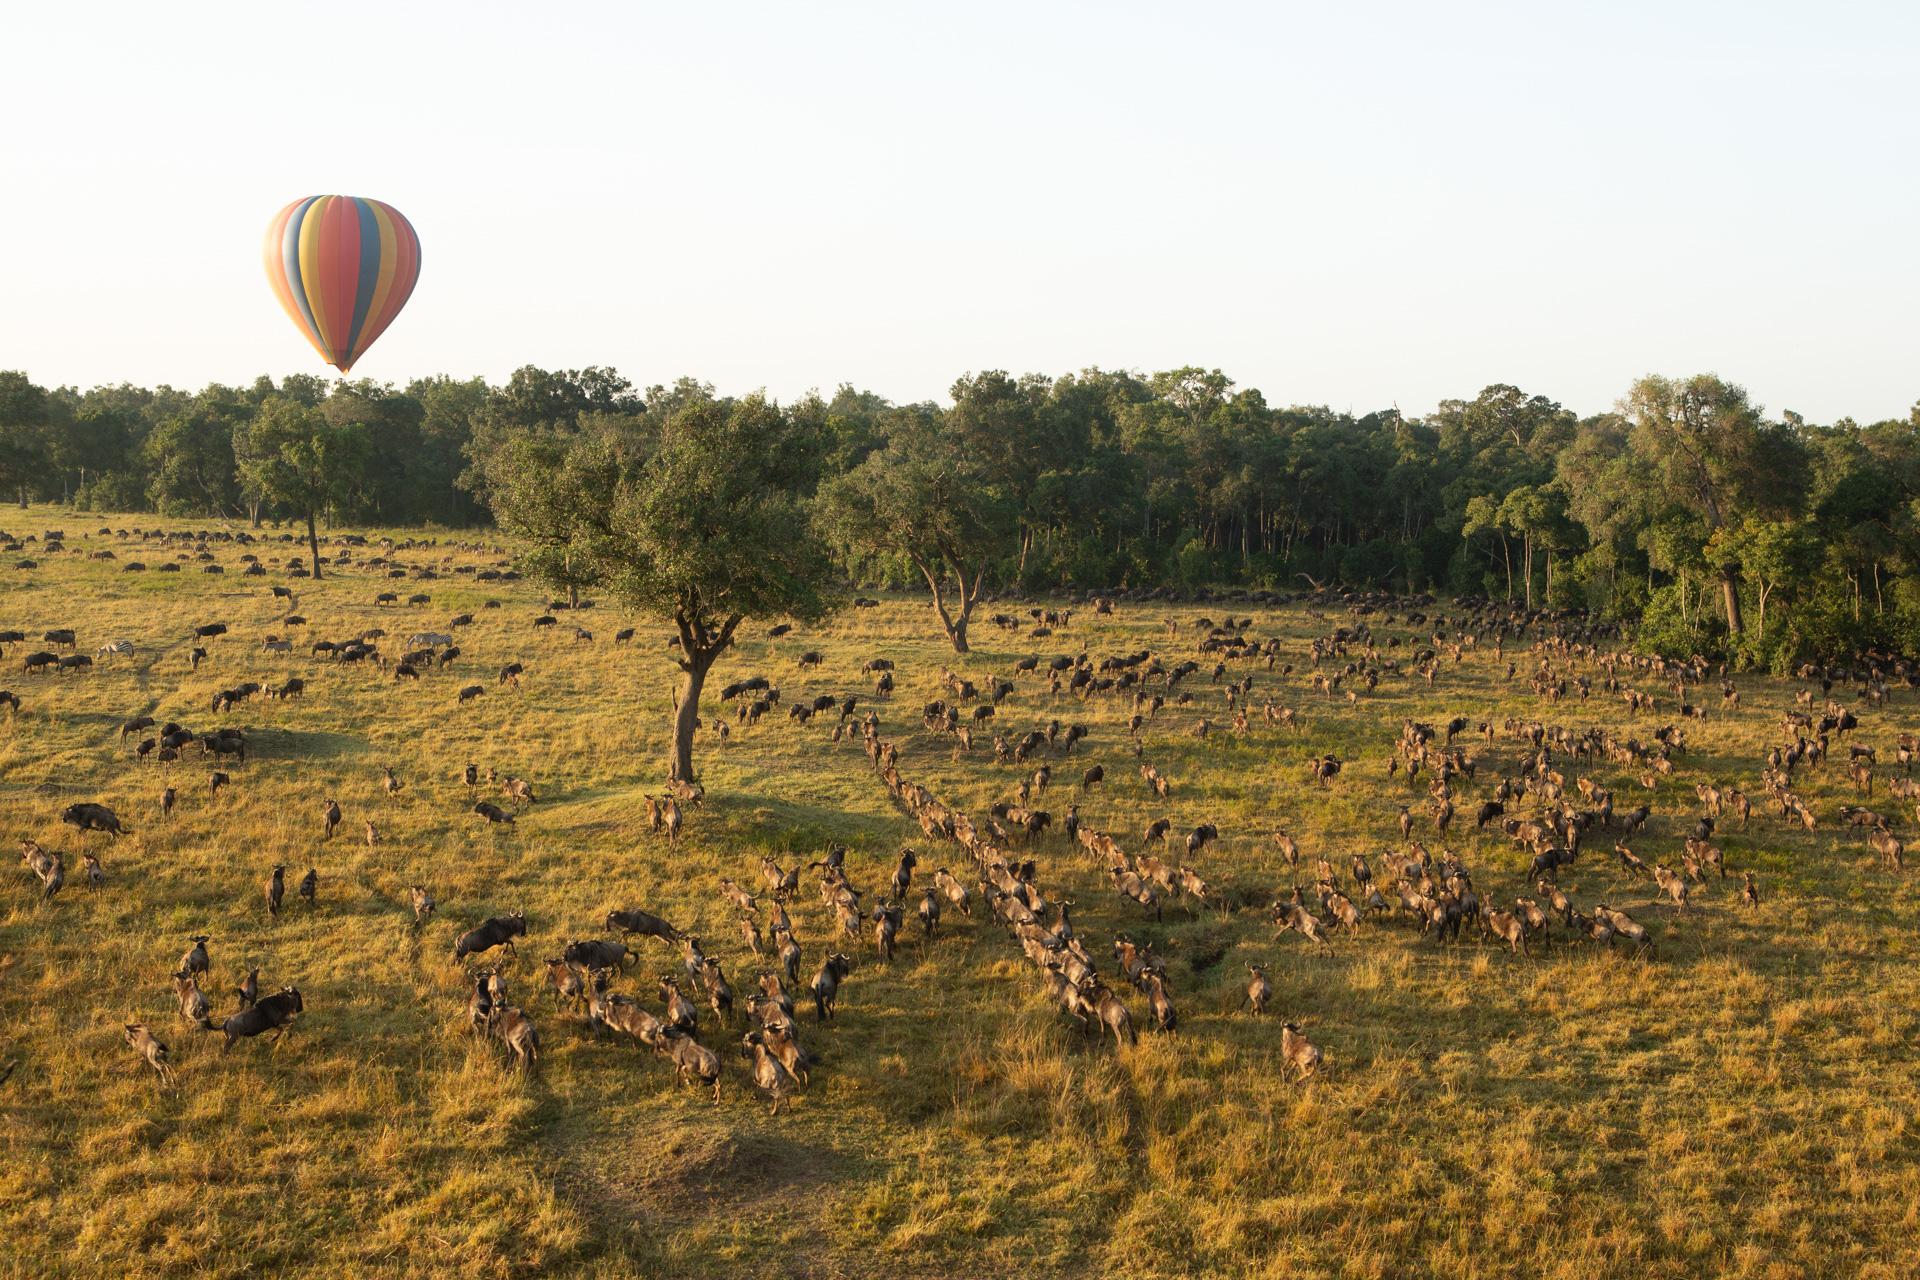 wildebeest and hot air balloon